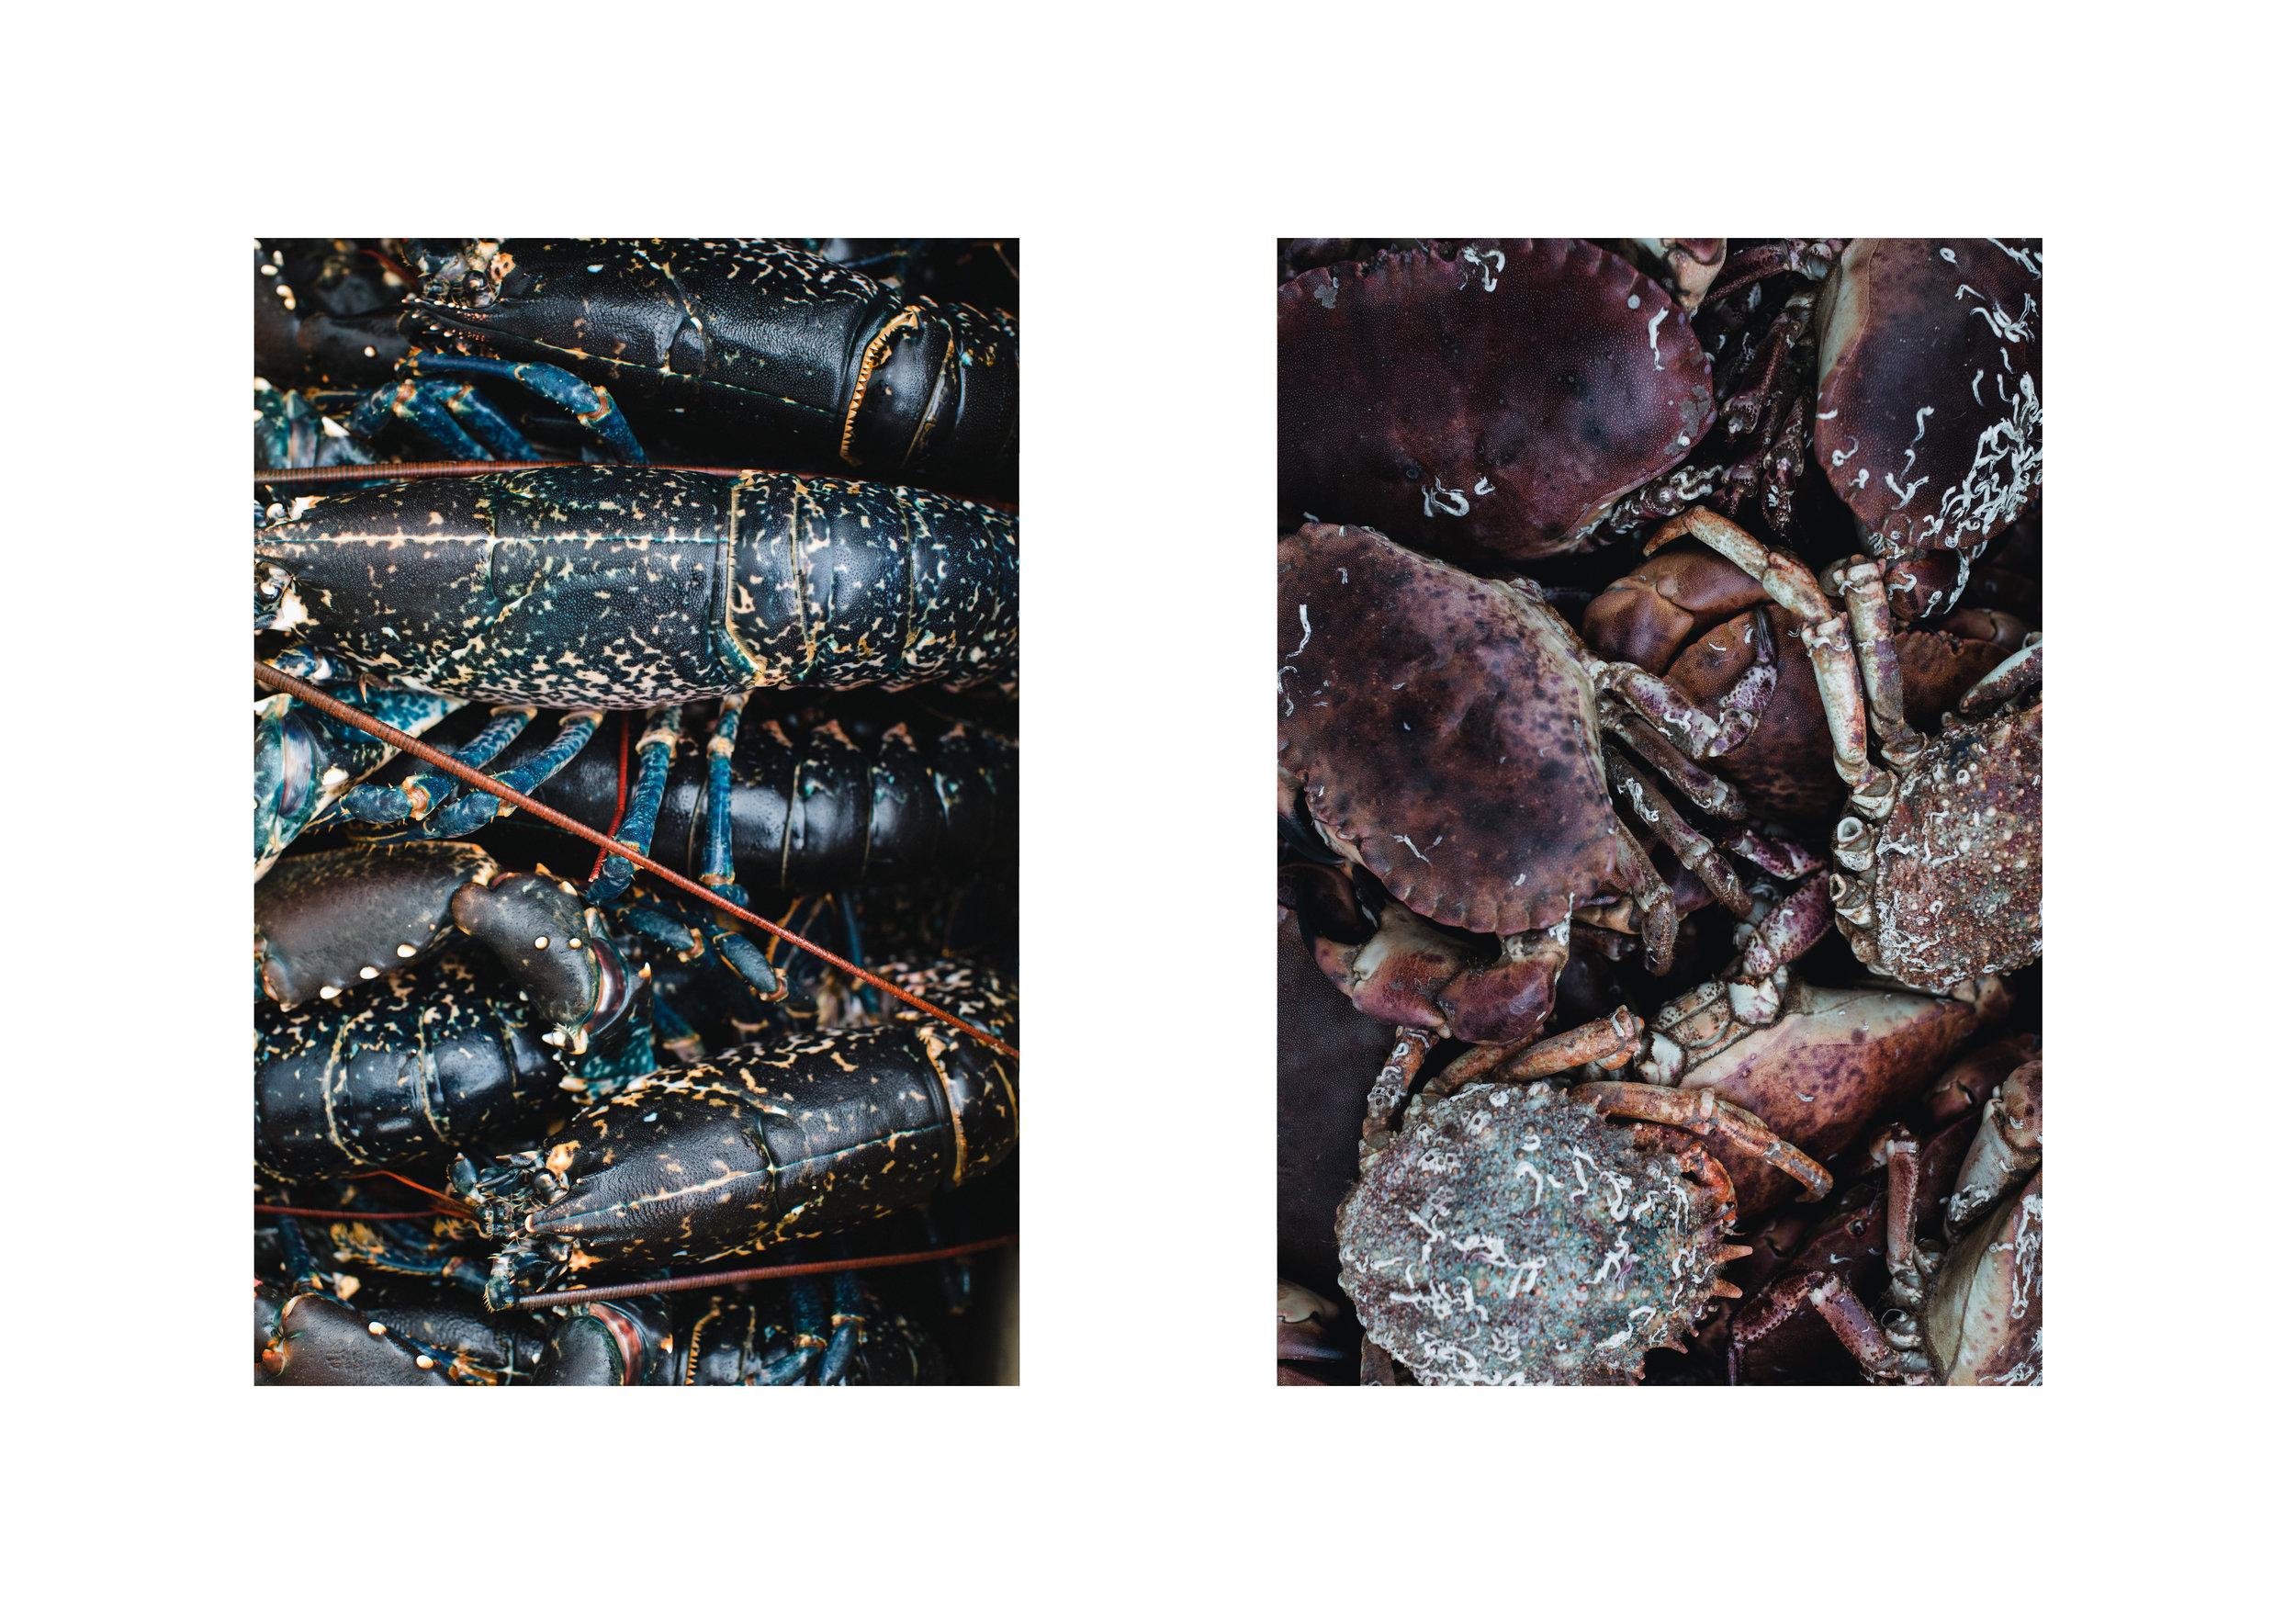 Fforest-Lobster-02.jpg